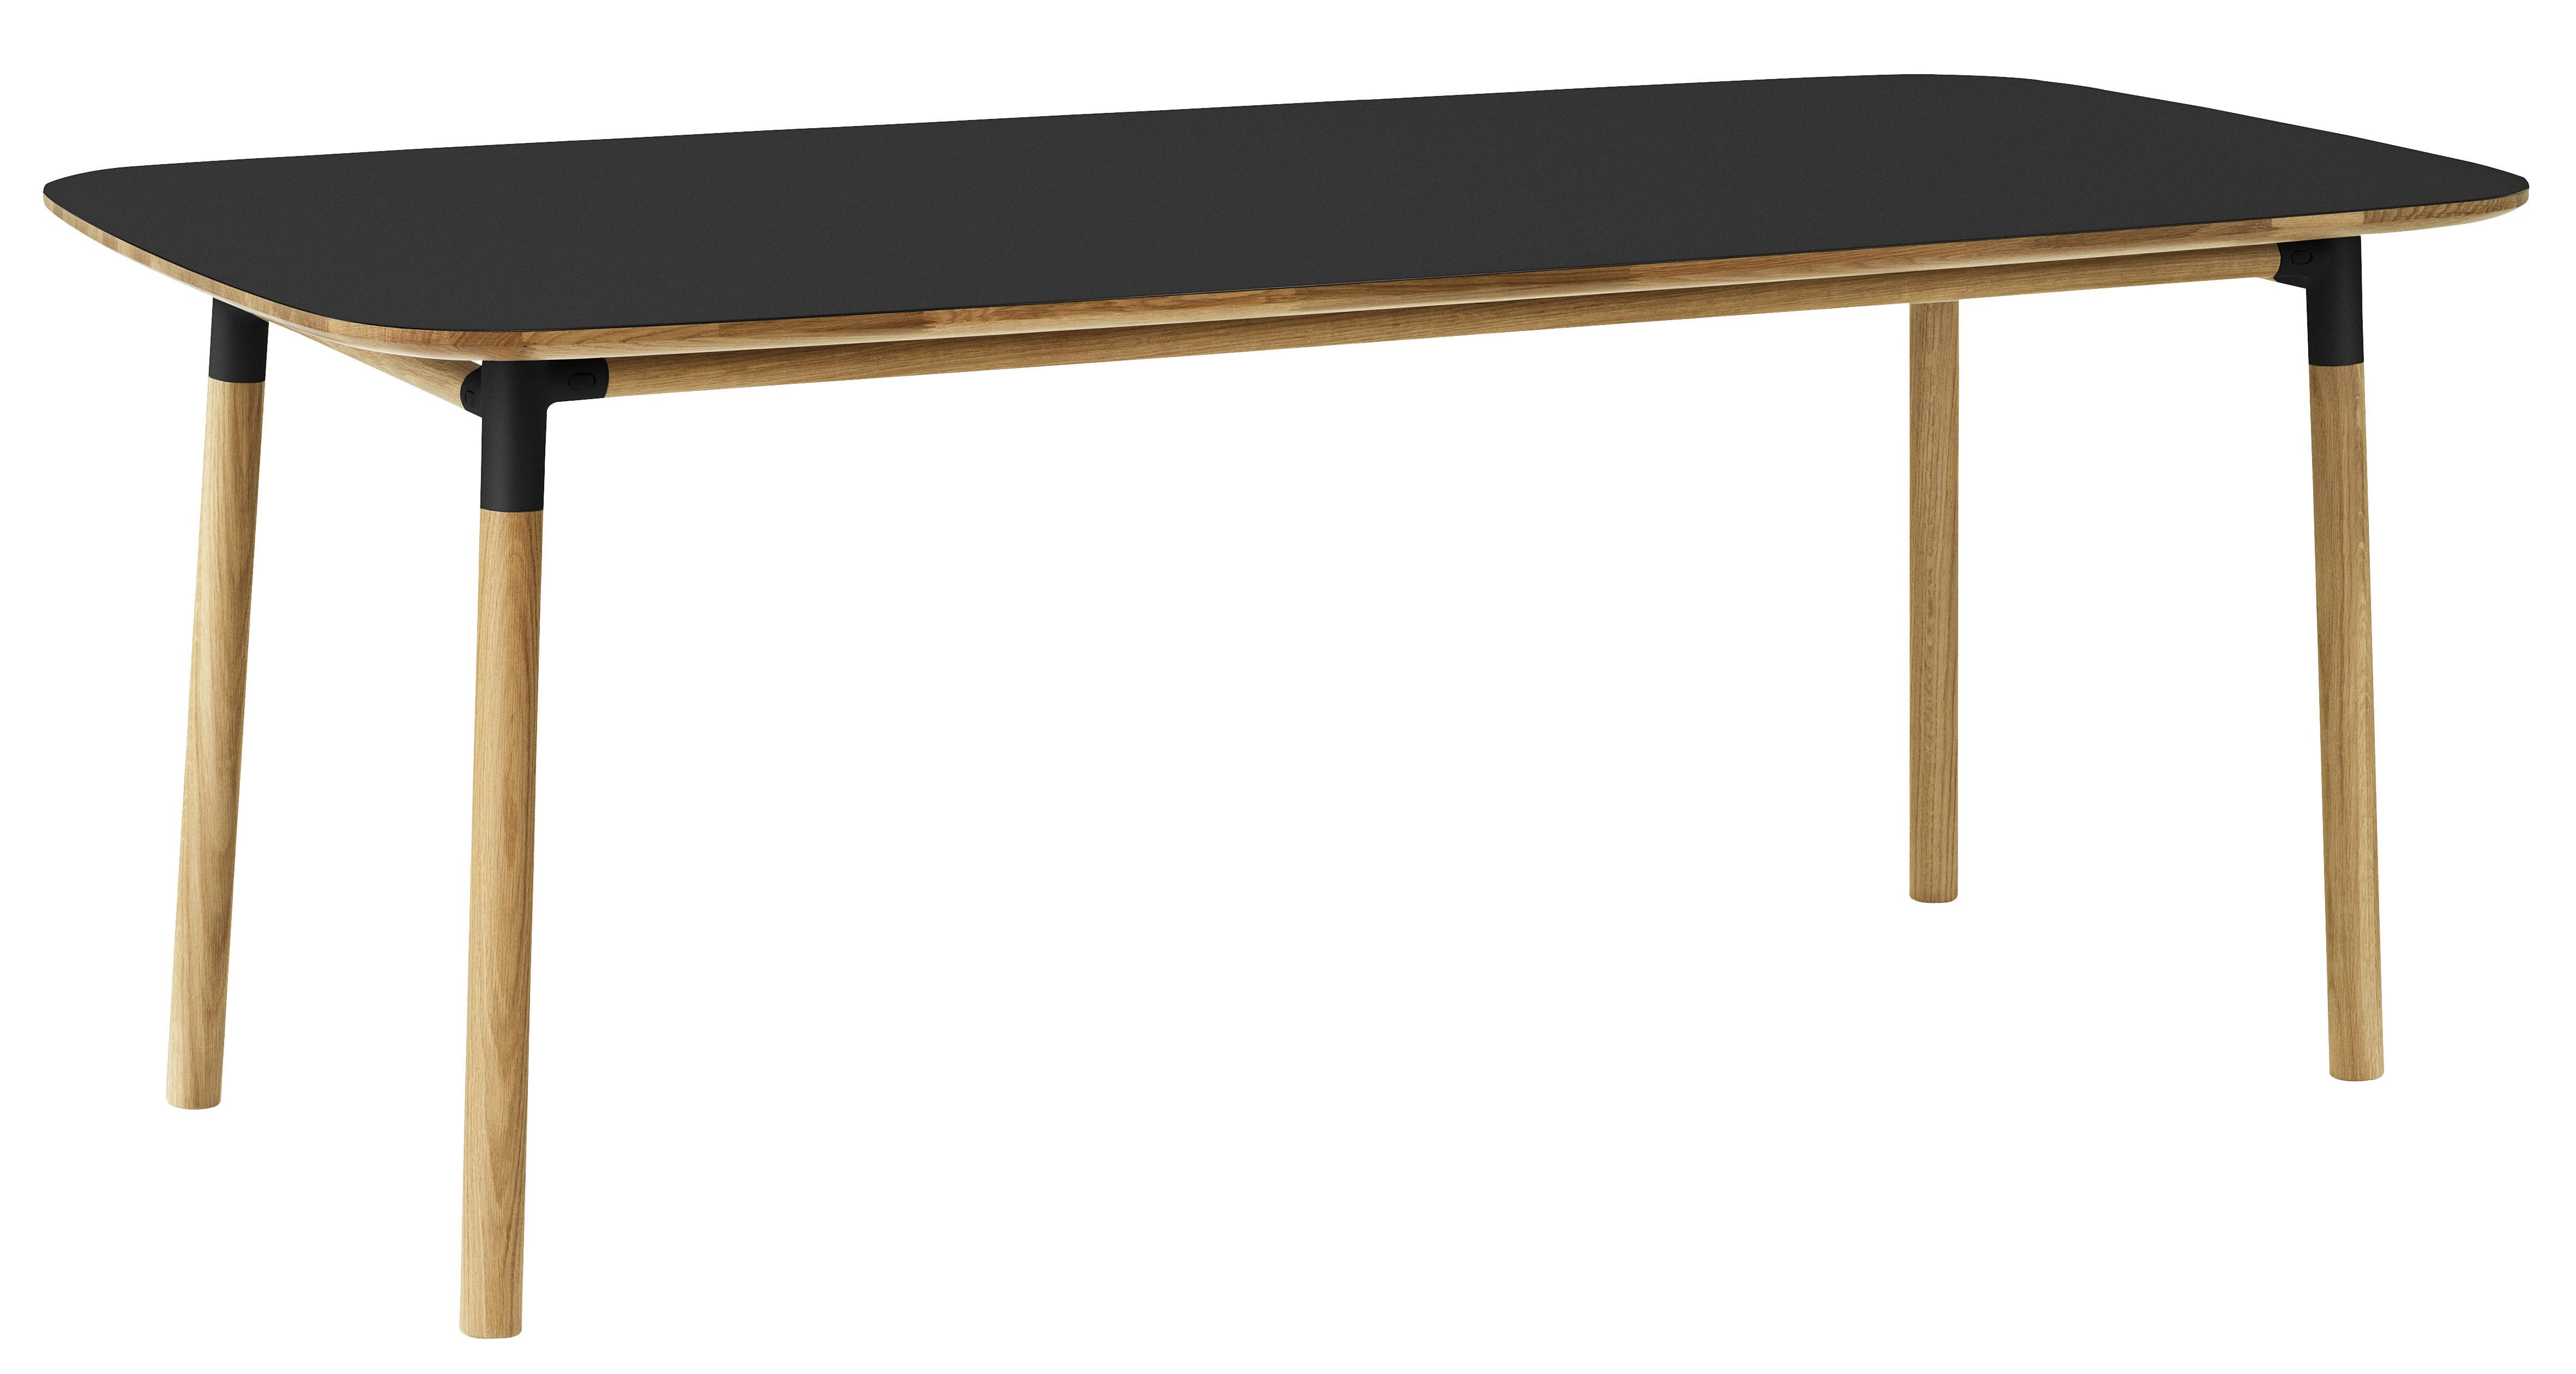 Furniture - Dining Tables - Form Rectangular table - 95 x 200 cm by Normann Copenhagen - Black / oak - Linoleum, Oak, Polypropylene